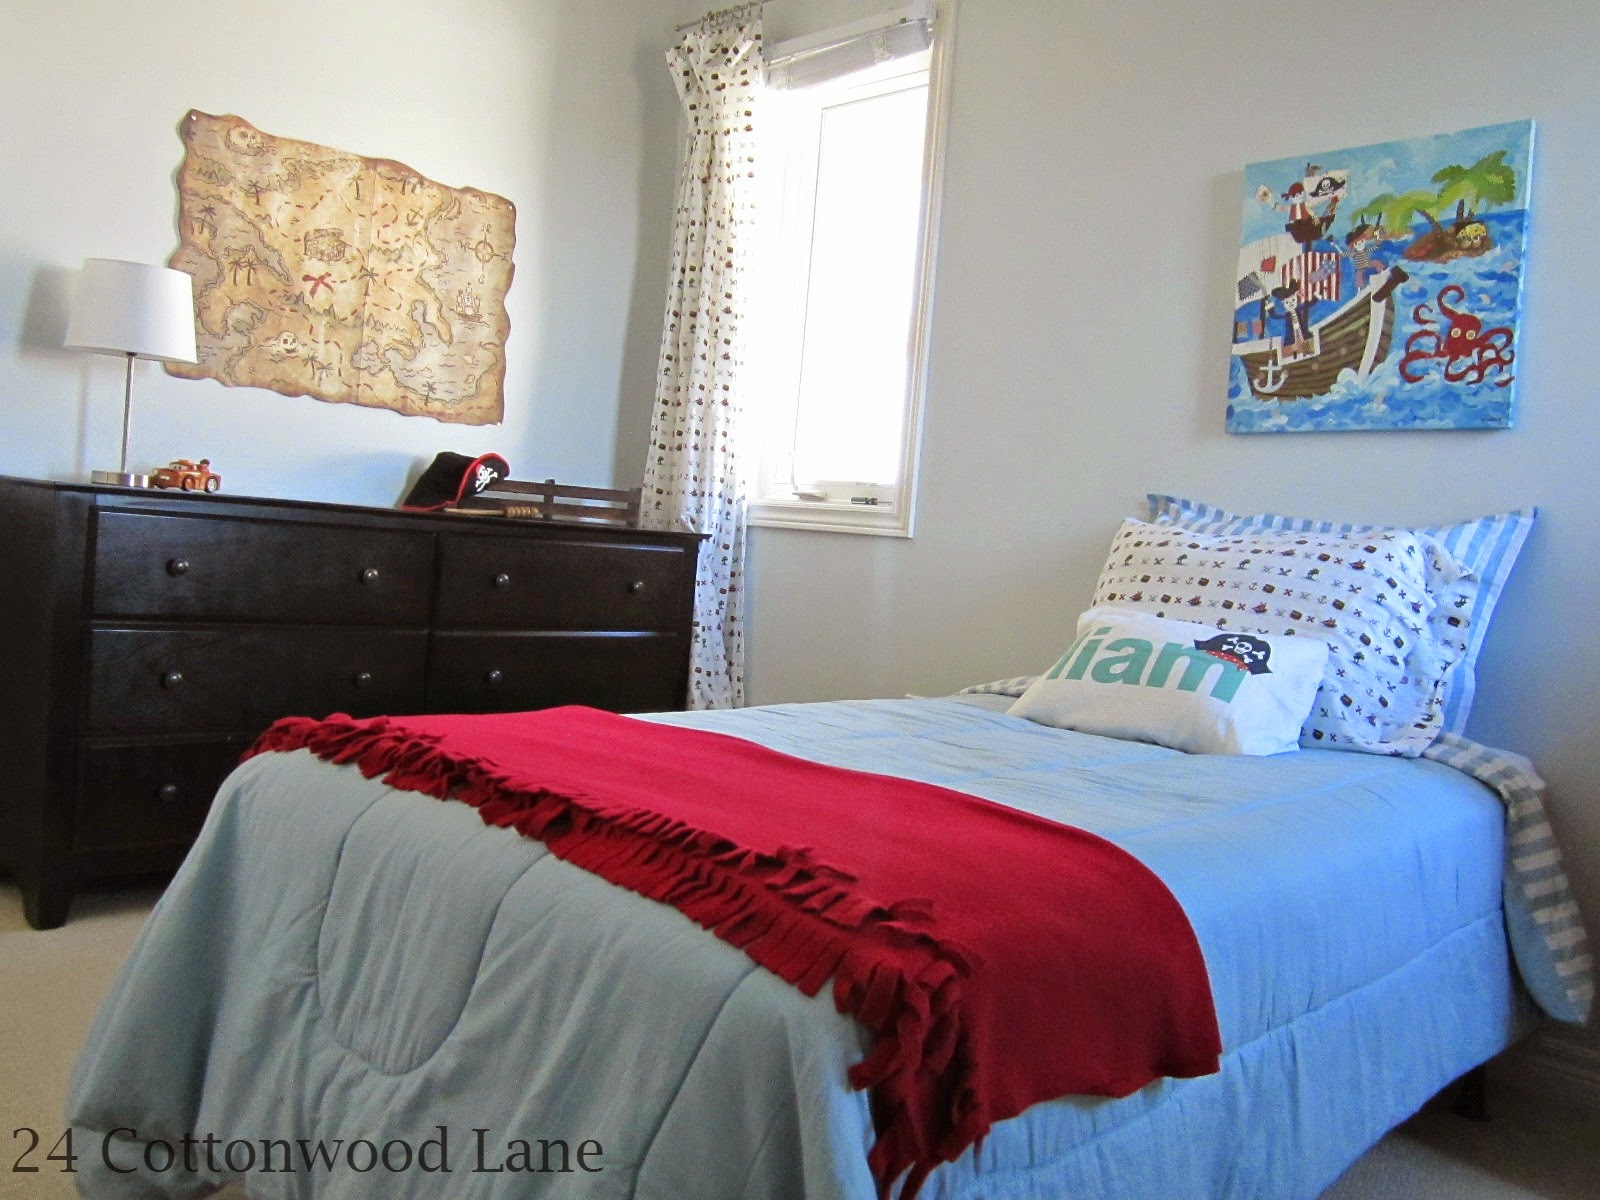 Pirate Bedroom Accessories Boys Pirate Bedroom Cottonwood Lane Designs